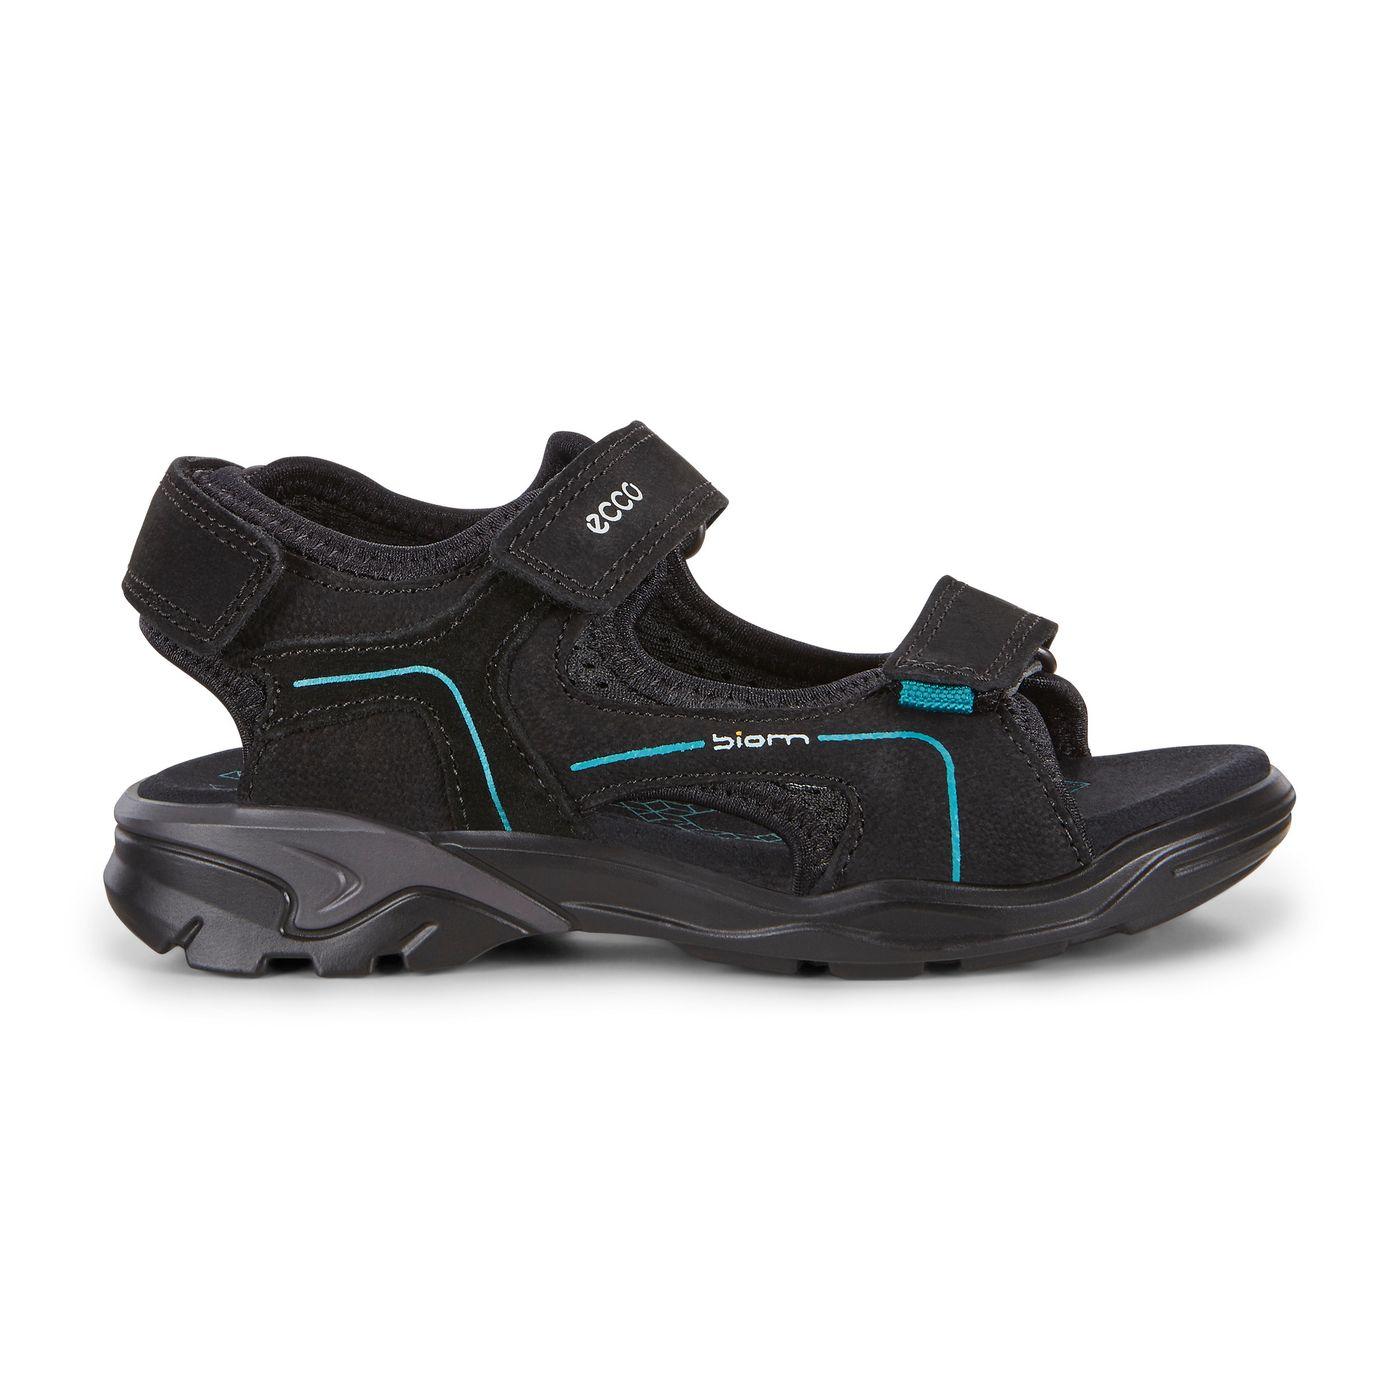 ECCO BIOM RAFT Flat Sandal | Ecco shoes